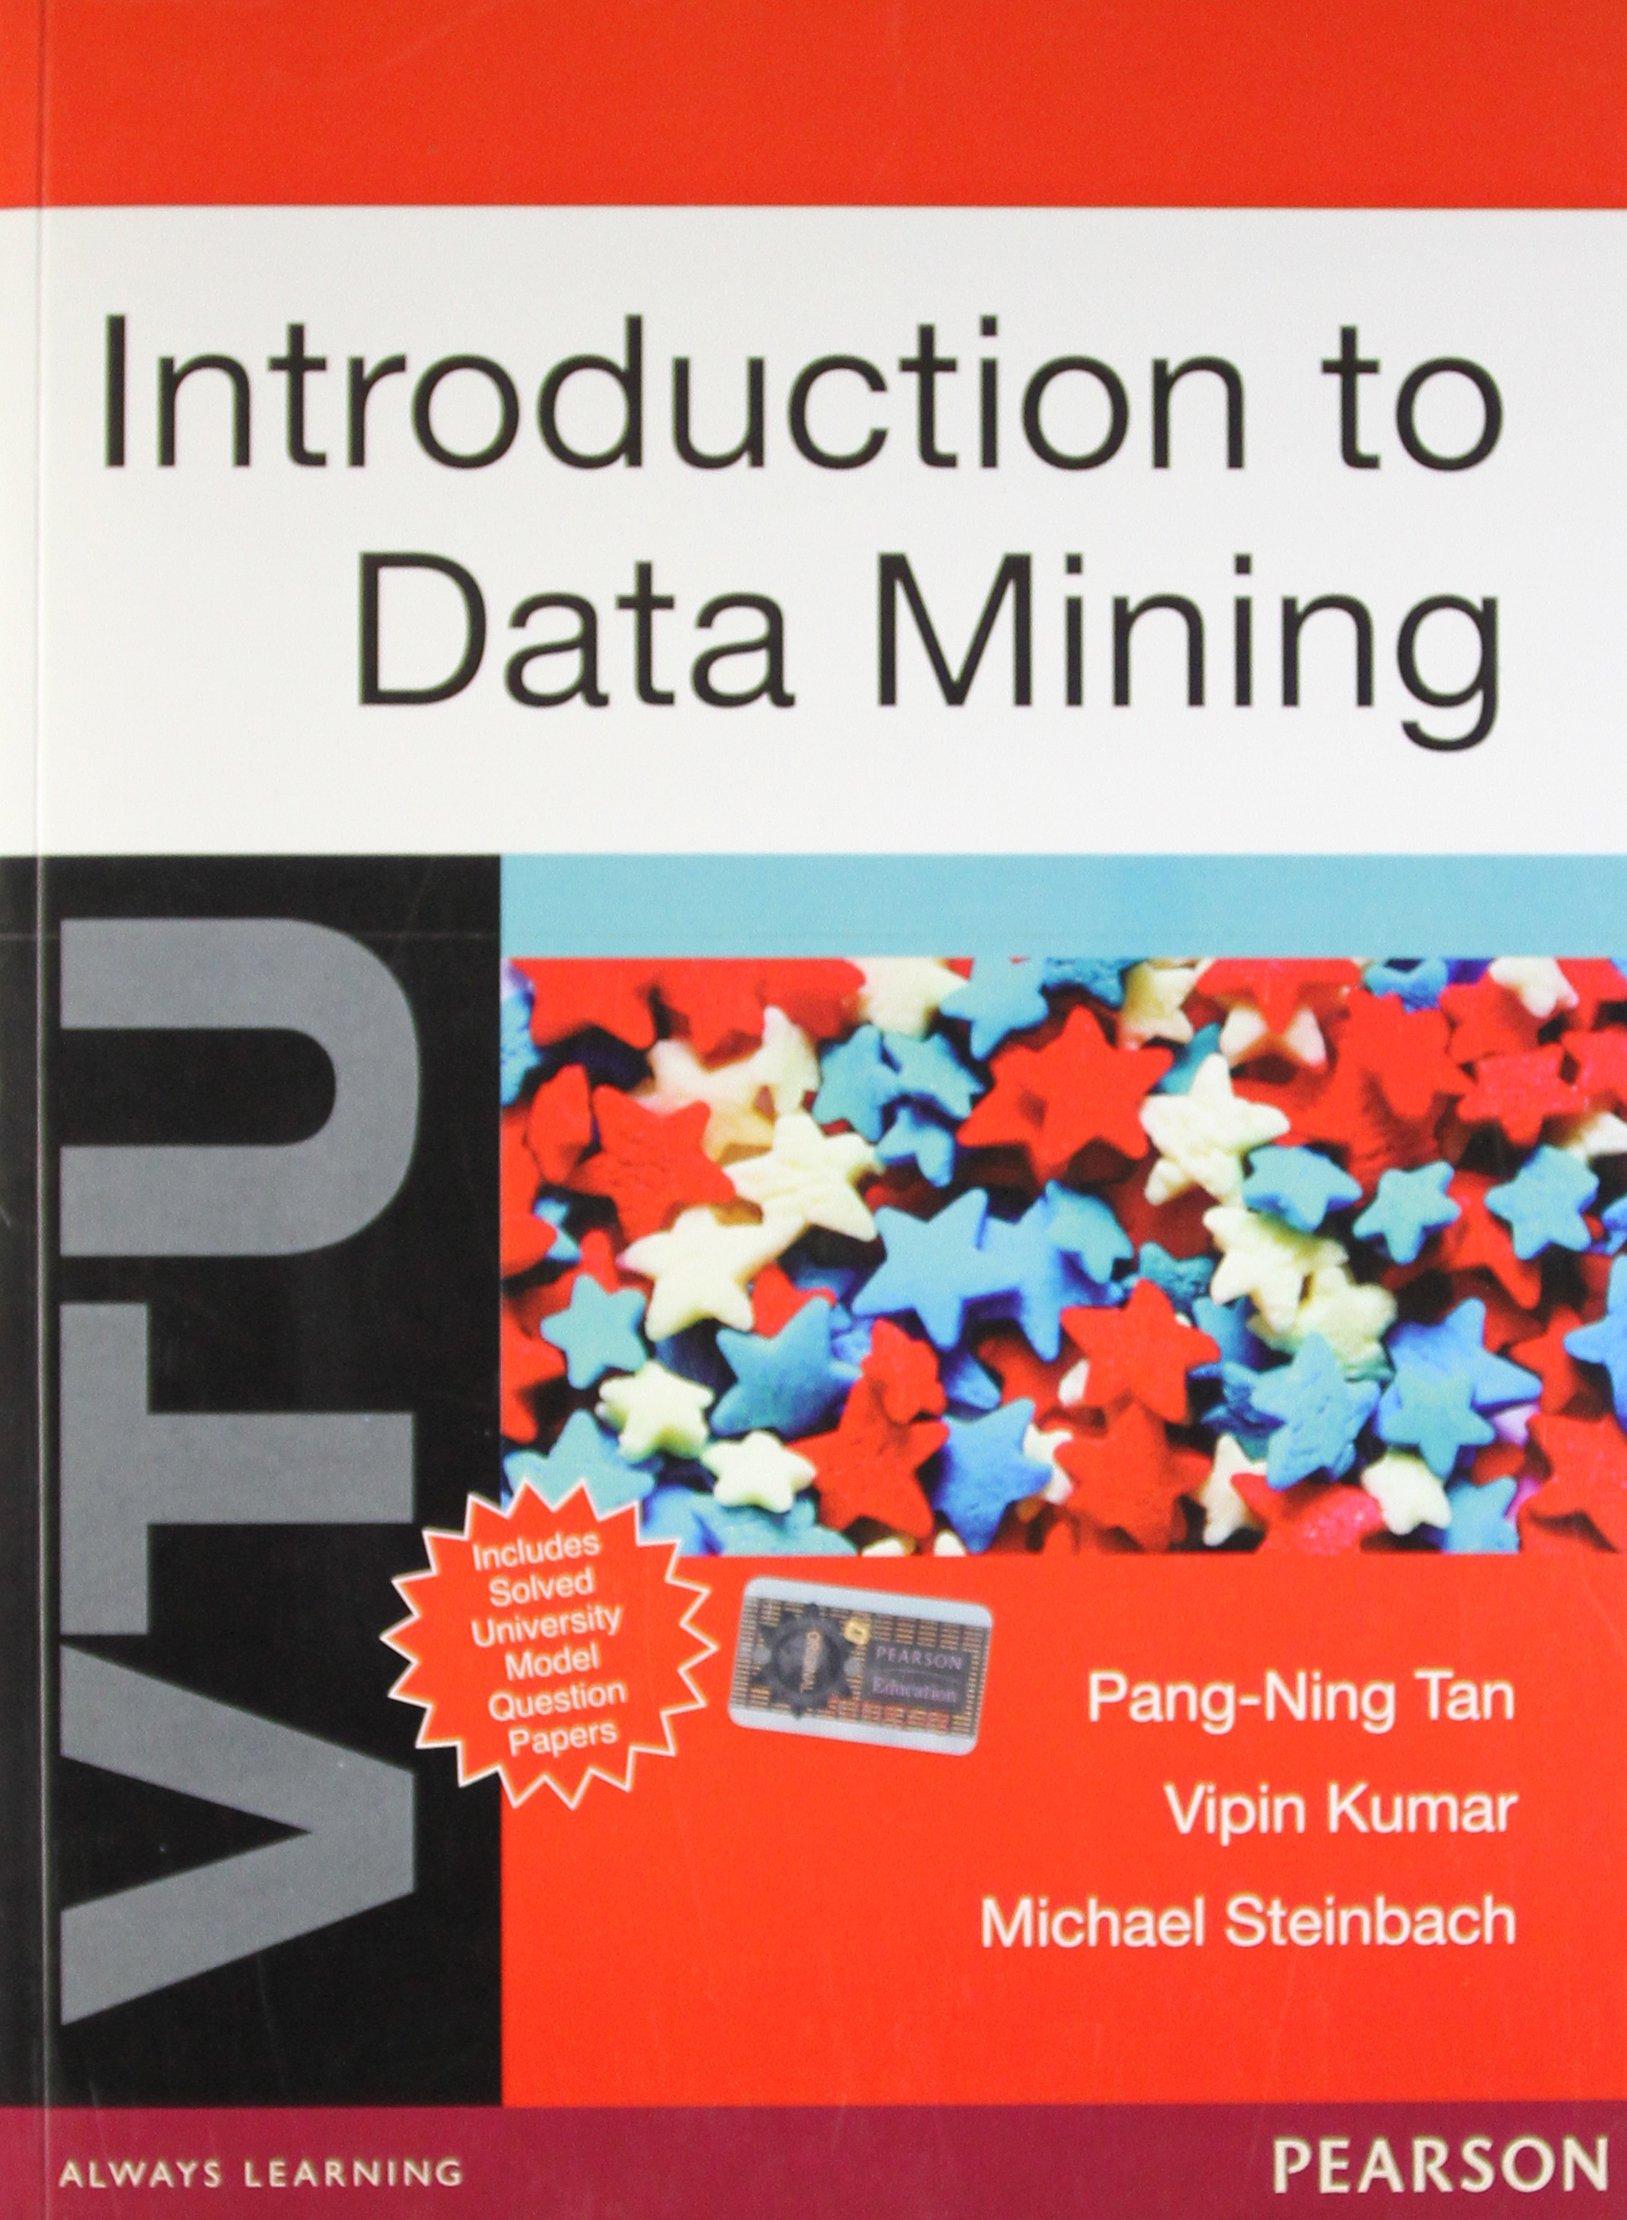 Introduction To Data Mining Pang-ning Tan Pdf